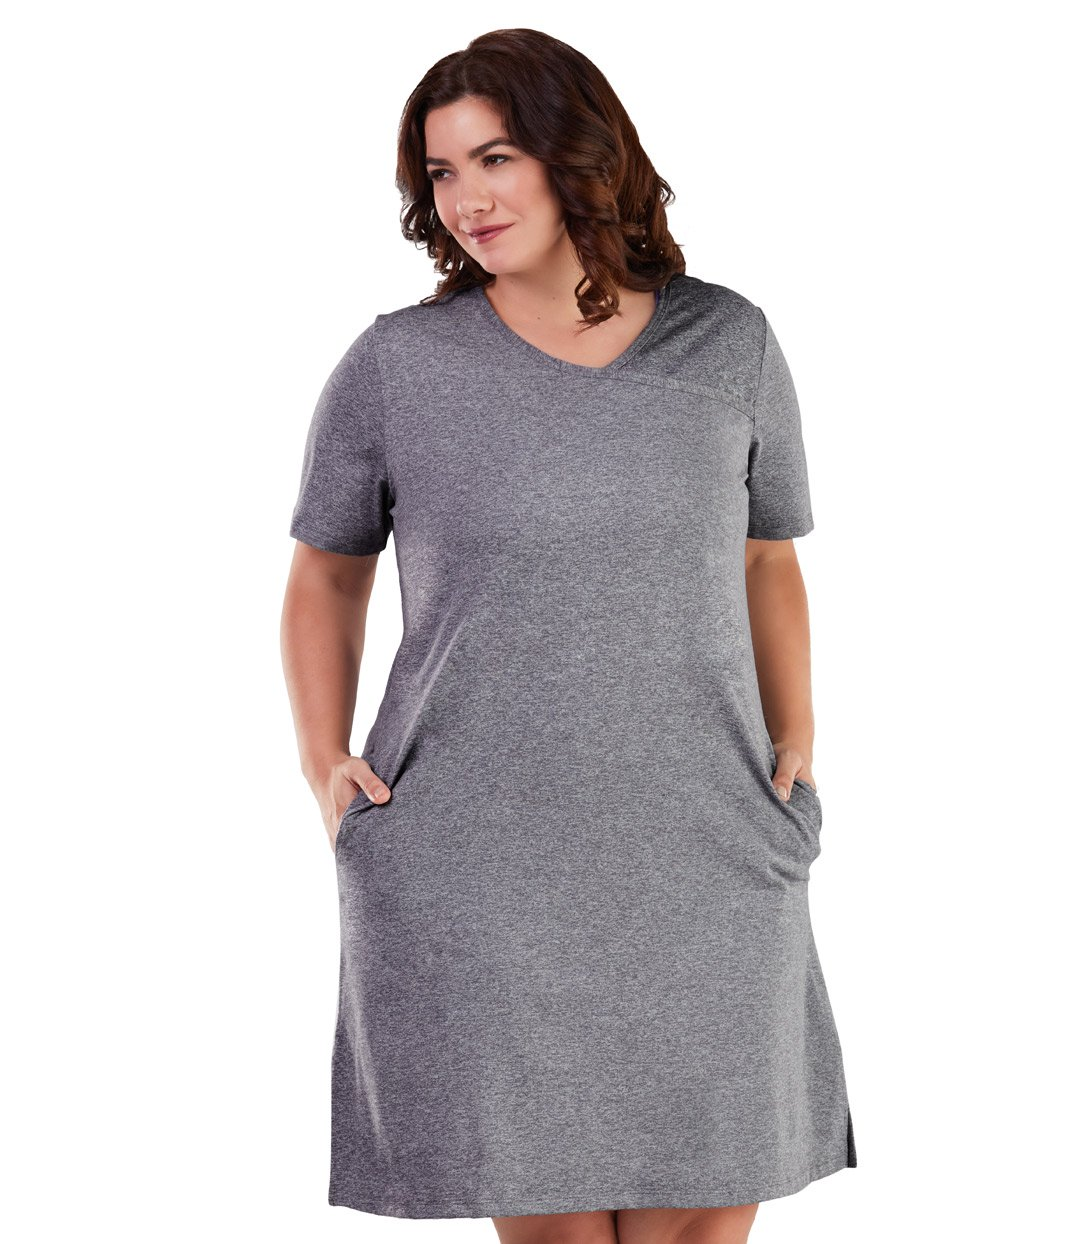 JunoActive gray short sleeved trail dress